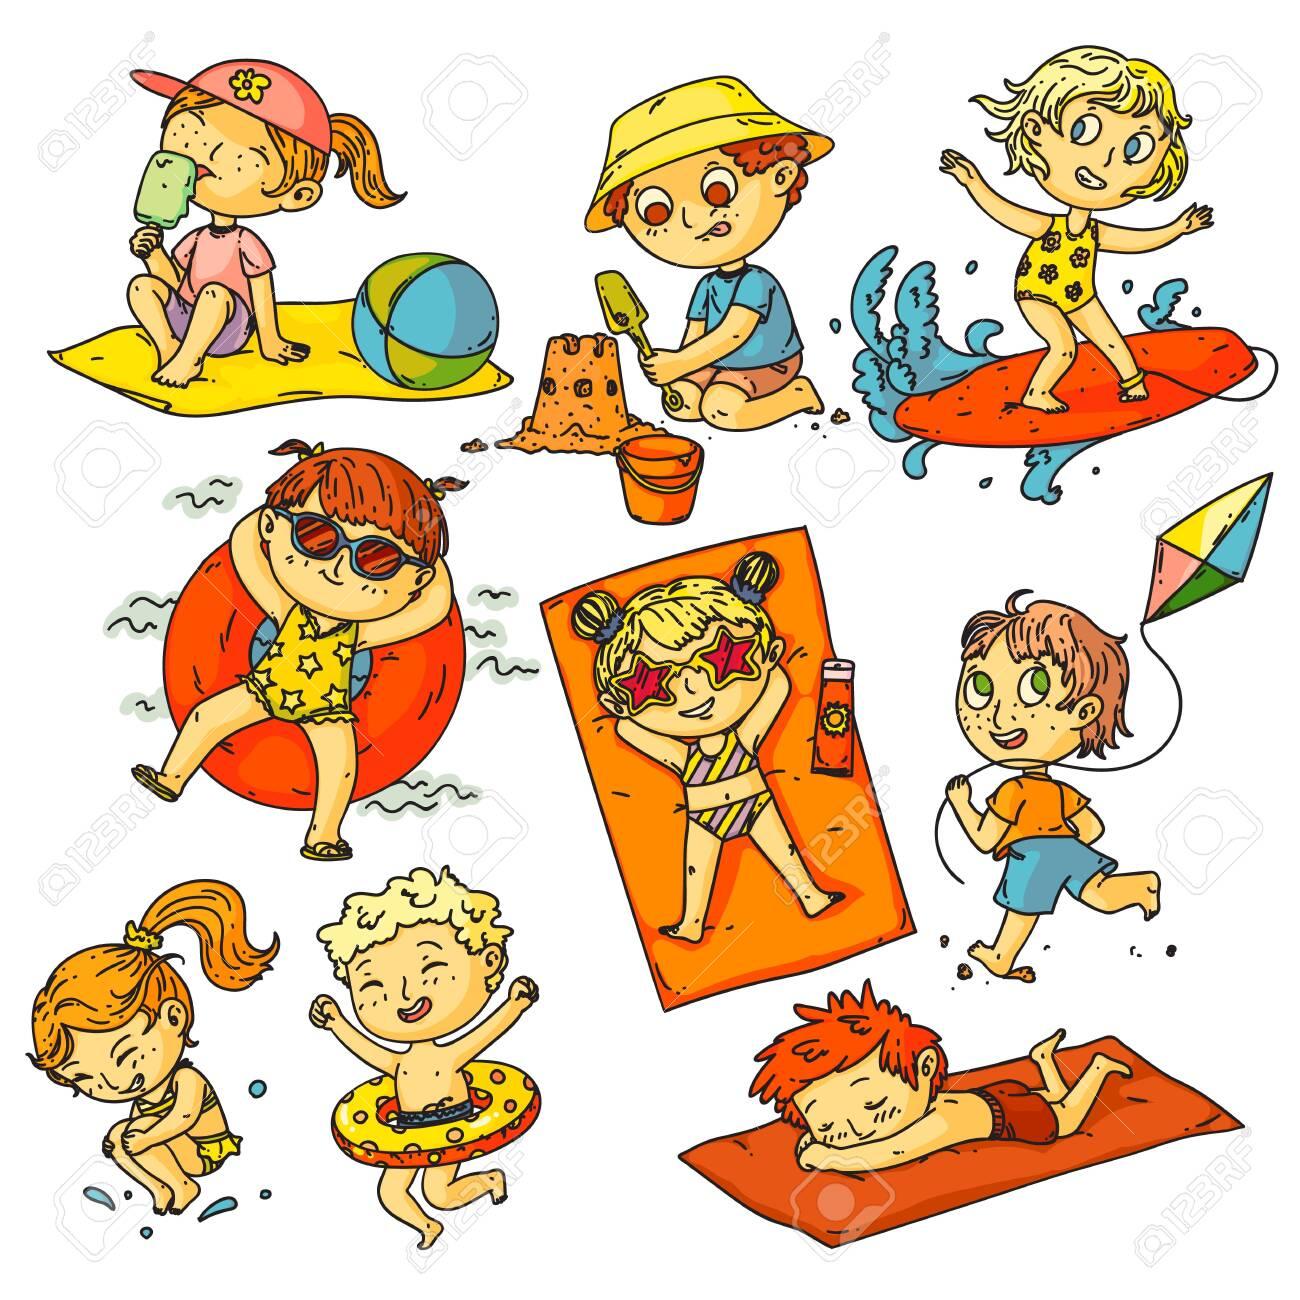 Kids summer vacation. Children beach activities set. Happy kids people swimming in ocean, sunbathing, surfing, building sand castle, flying kite collection. Childhood summer vacation activities - 148299225